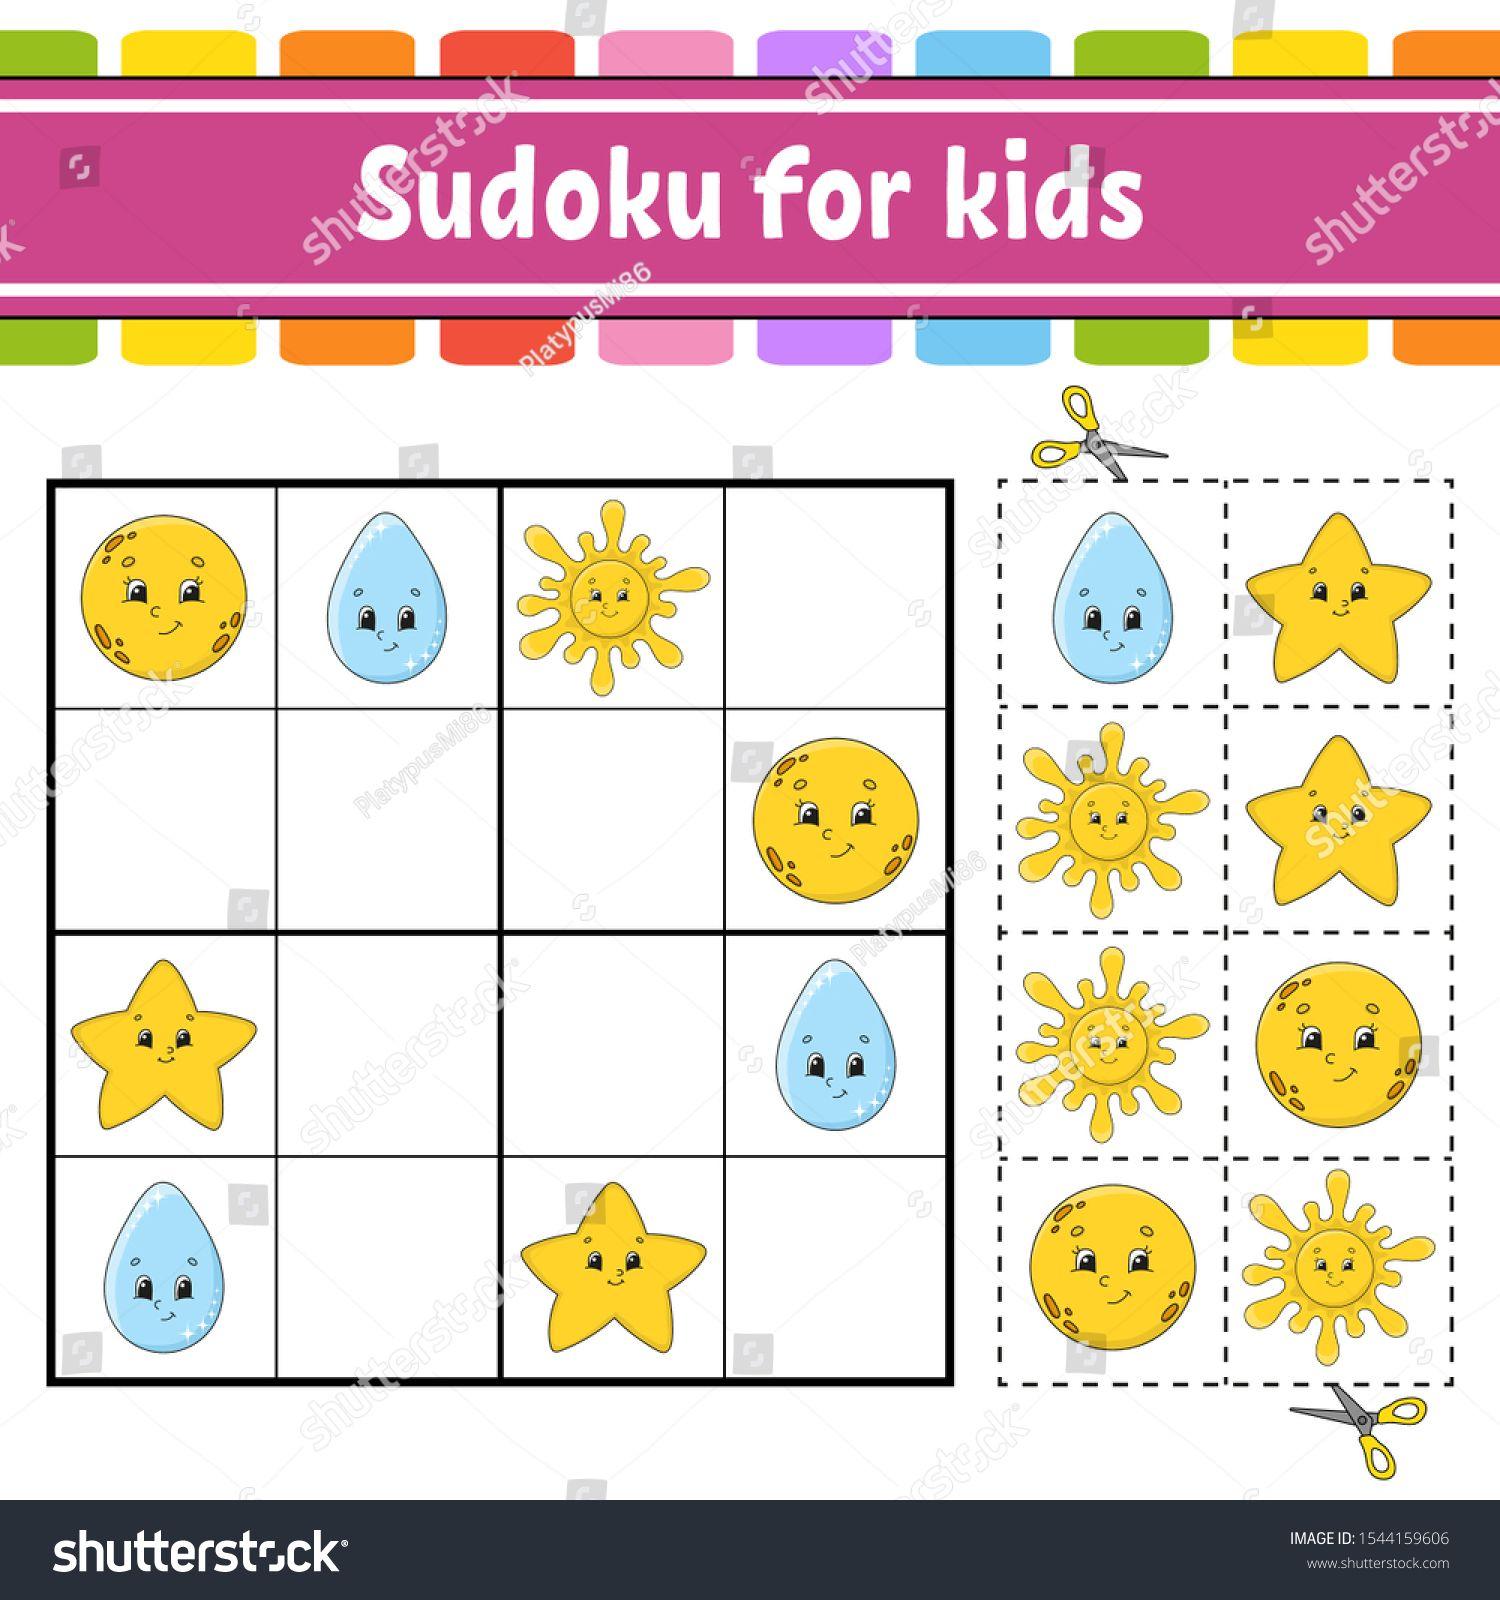 Sudoku For Kids Education Developing Worksheet Activity